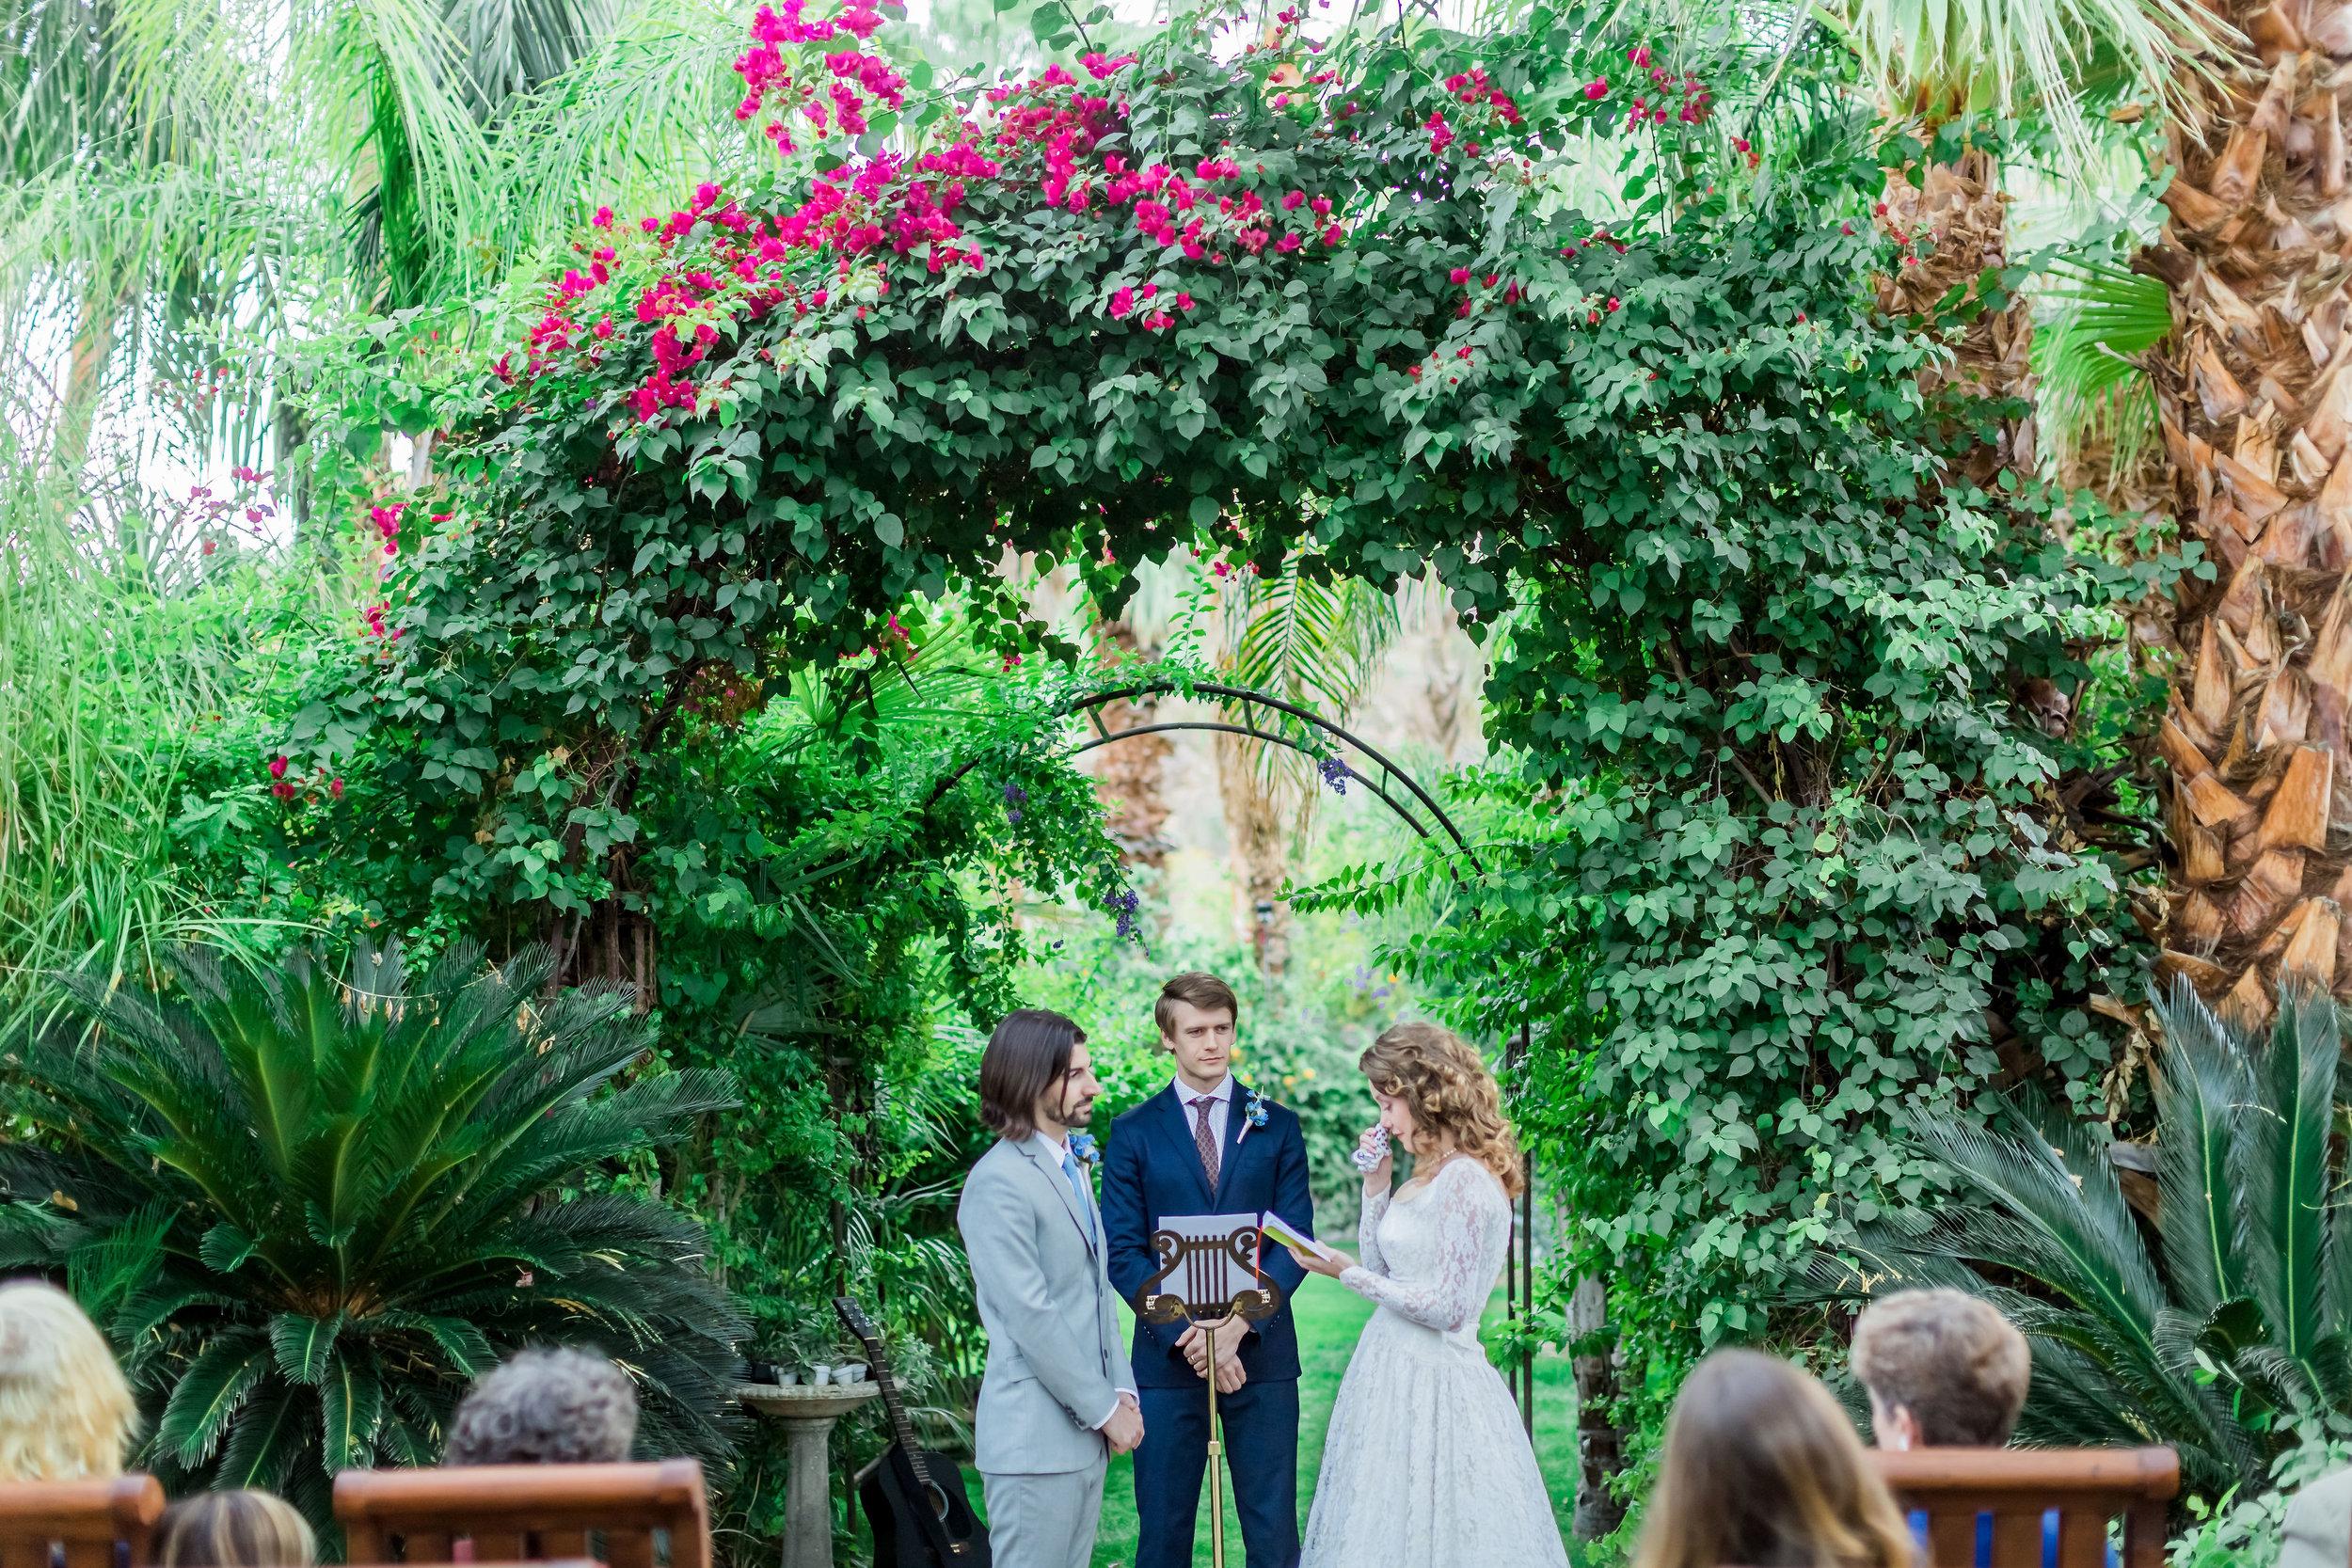 Elizabeth.Jonothan.wedding.2018.monocle.project-143.jpg